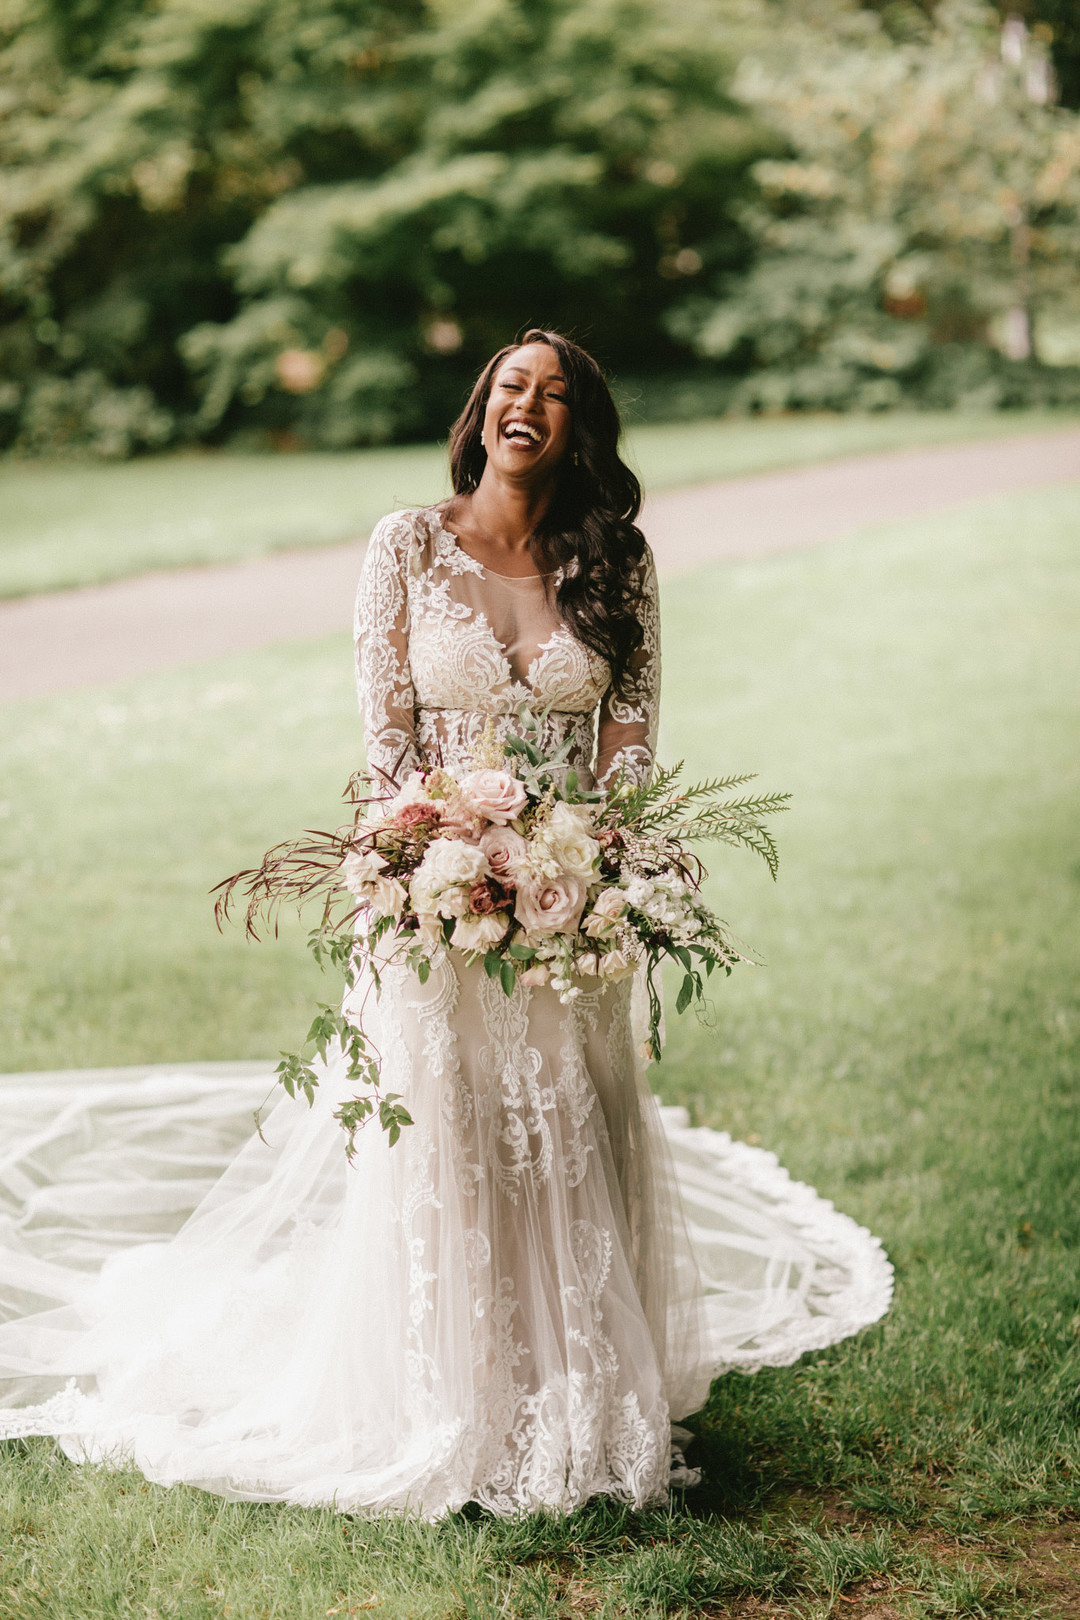 black bride laughing